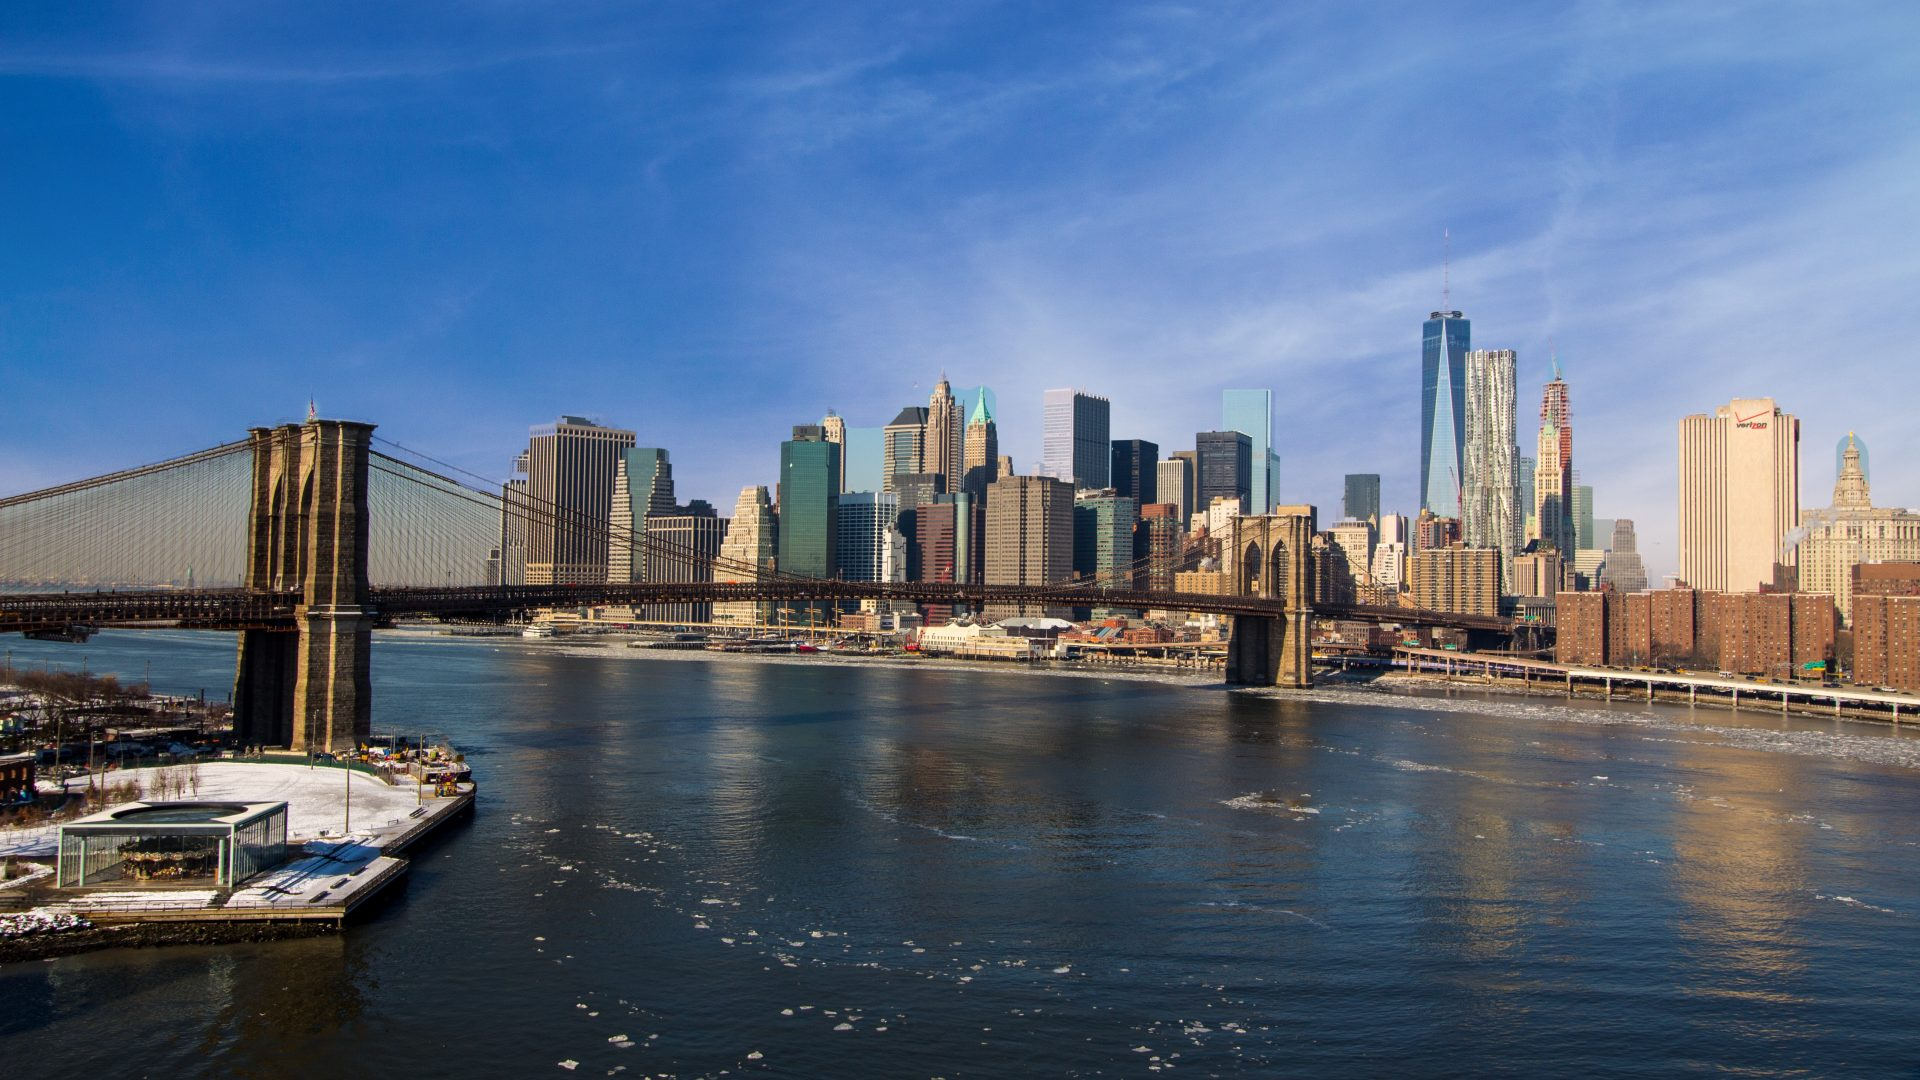 Brooklyn Bridge New York City 5k Uhd Wallpaper